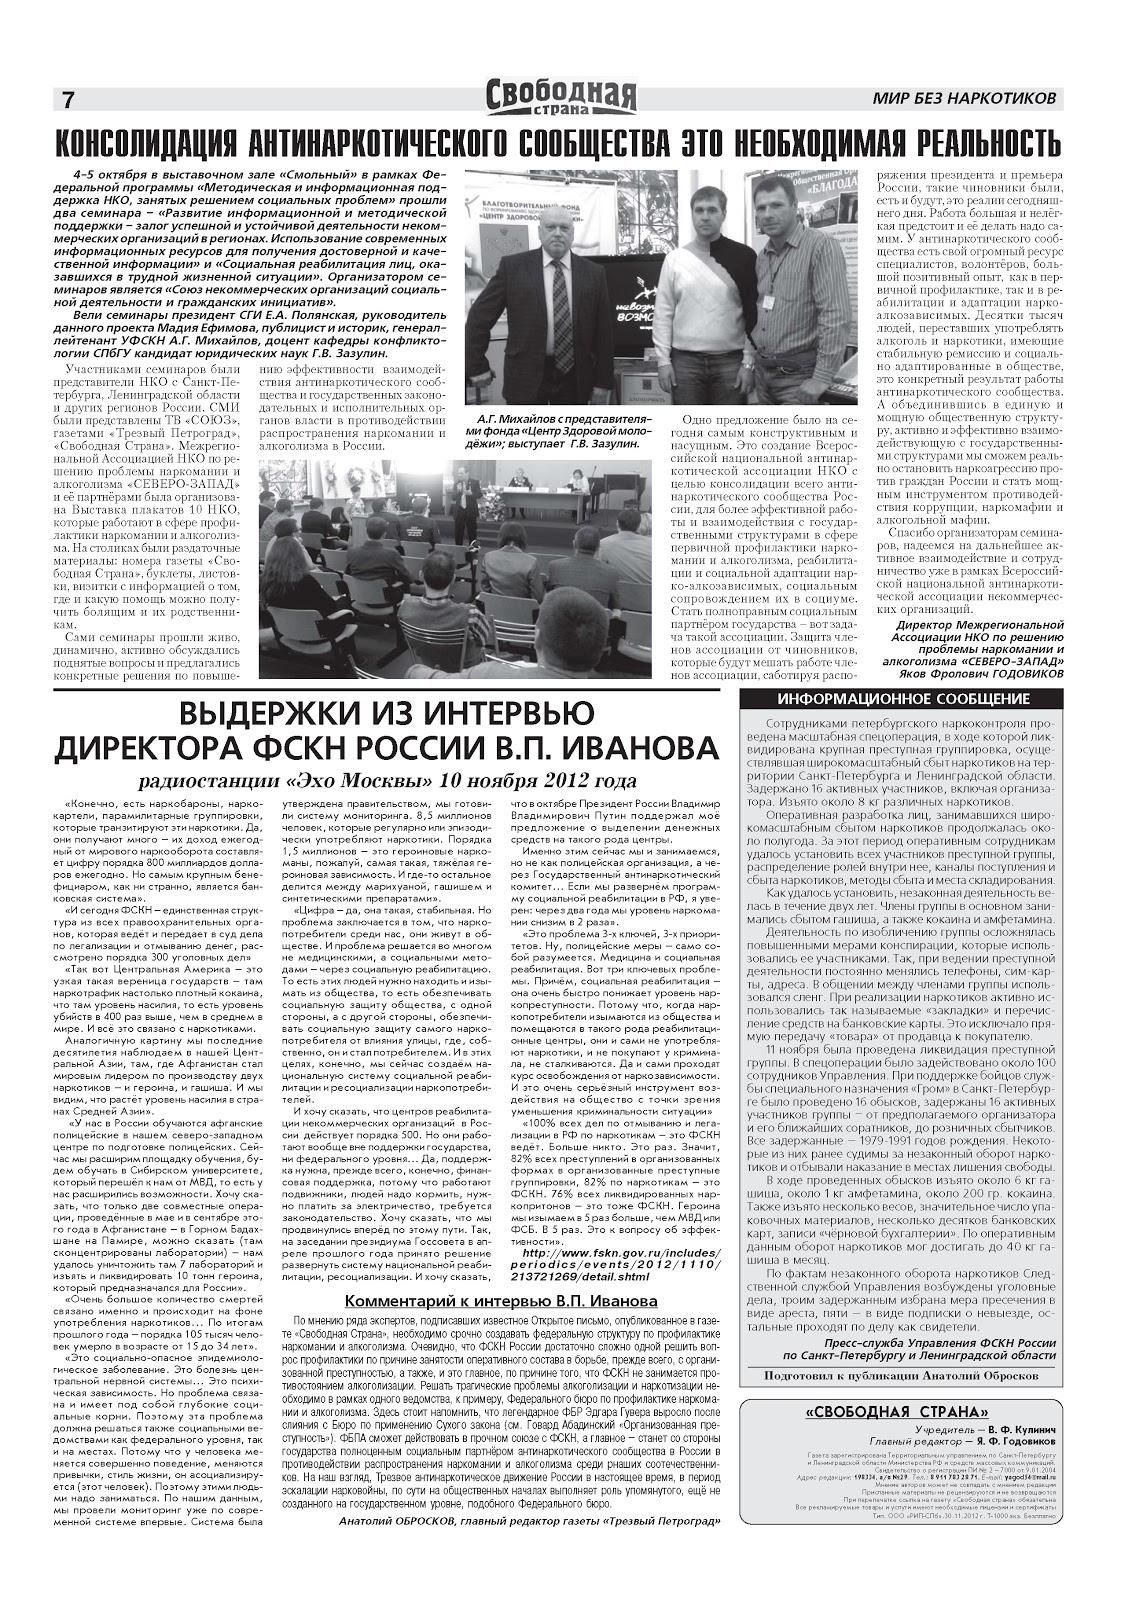 priznaki-tsirroza-pecheni-u-zhenshin-alkogolikov